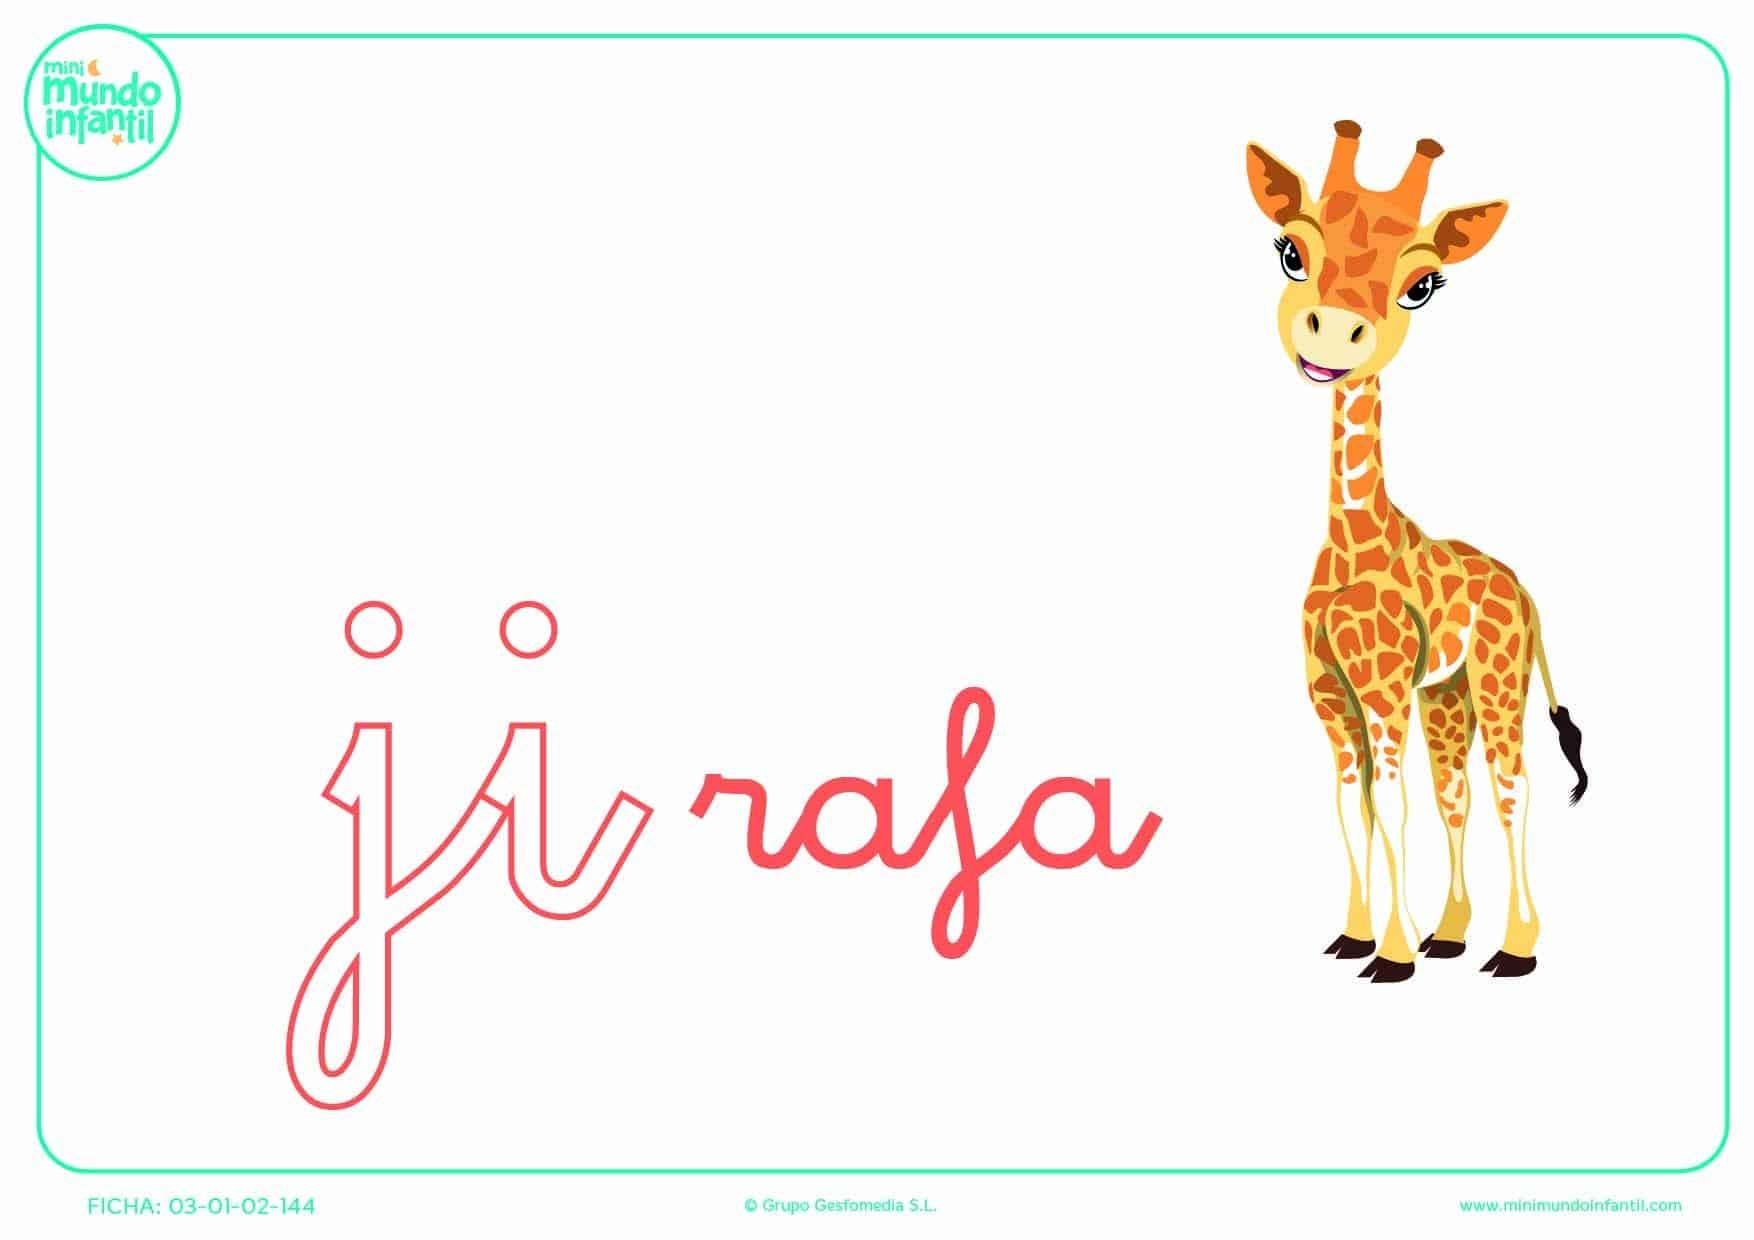 Sílaba JI de jirafa en minúsculas para completar